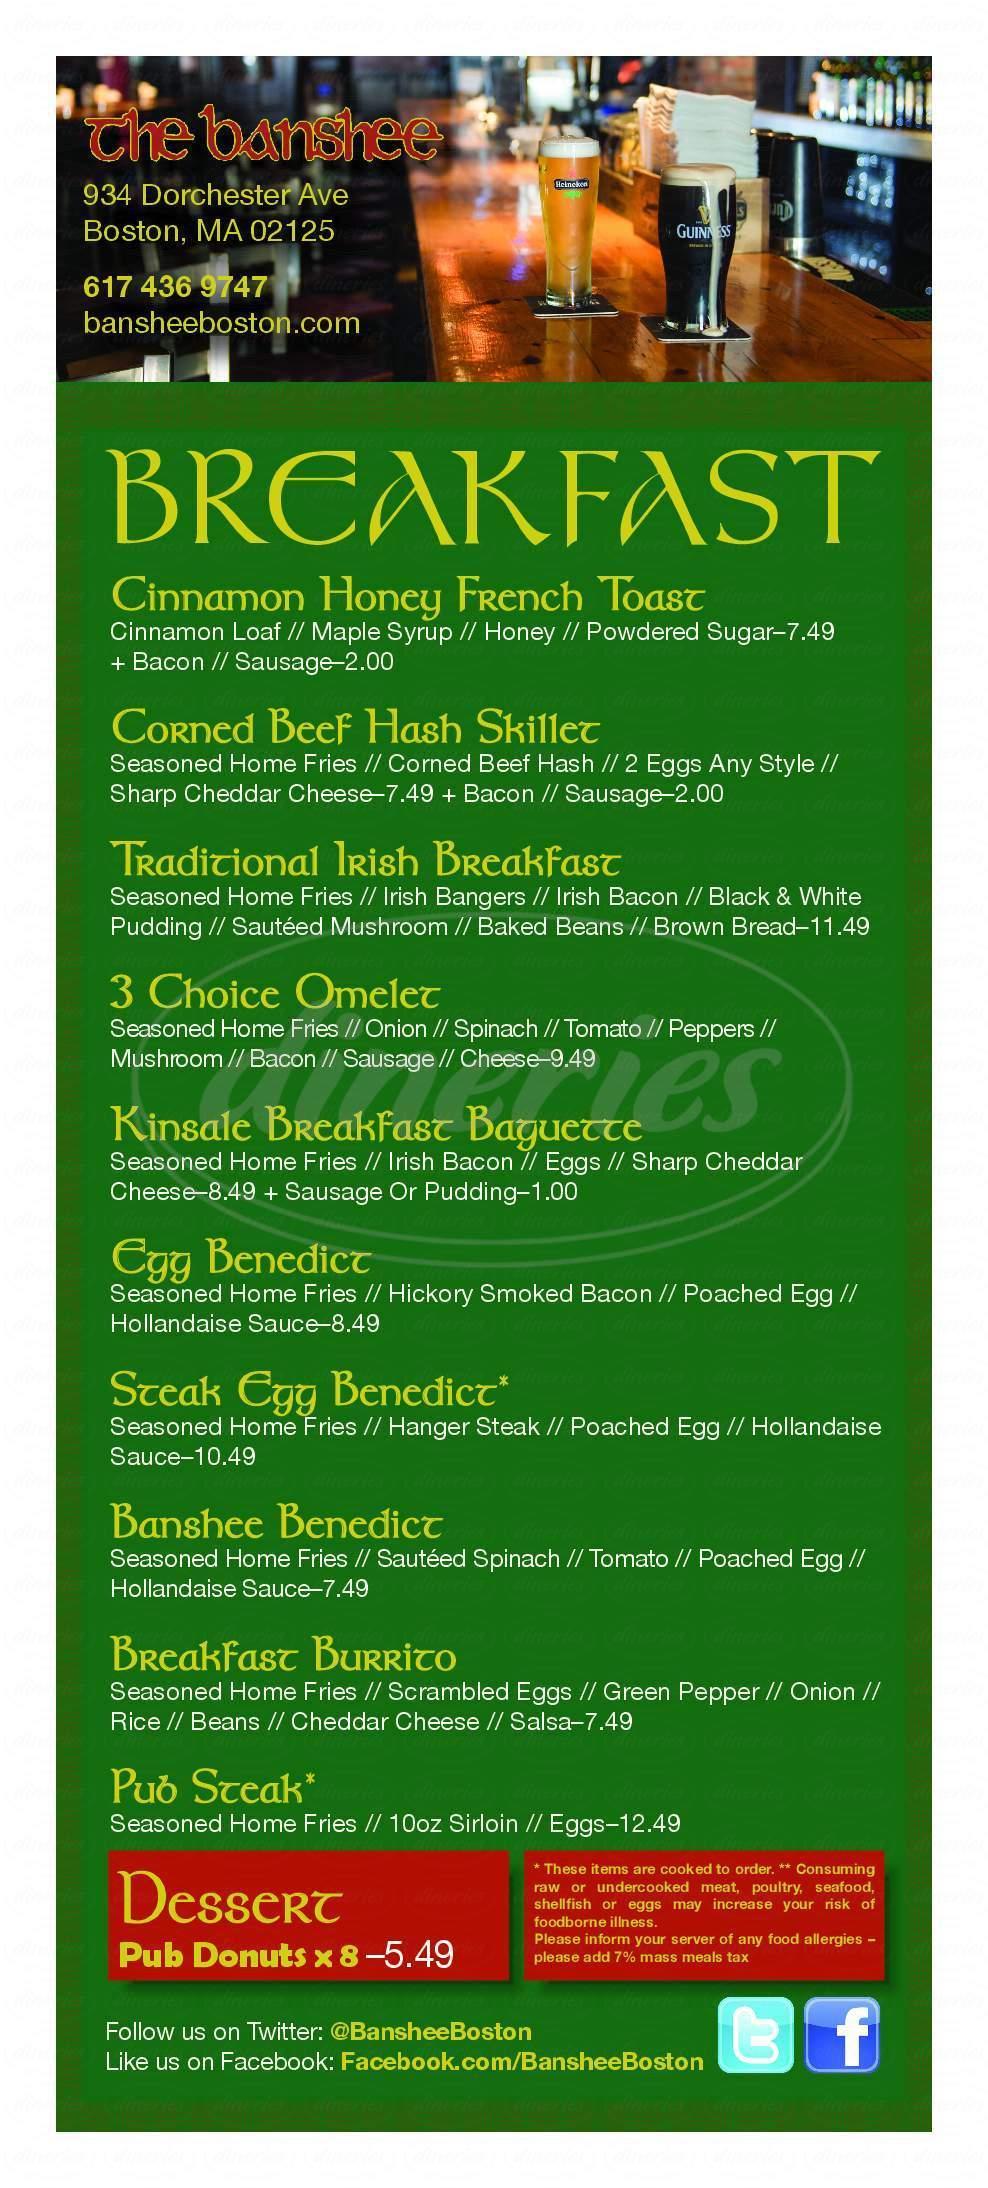 menu for The Banshee